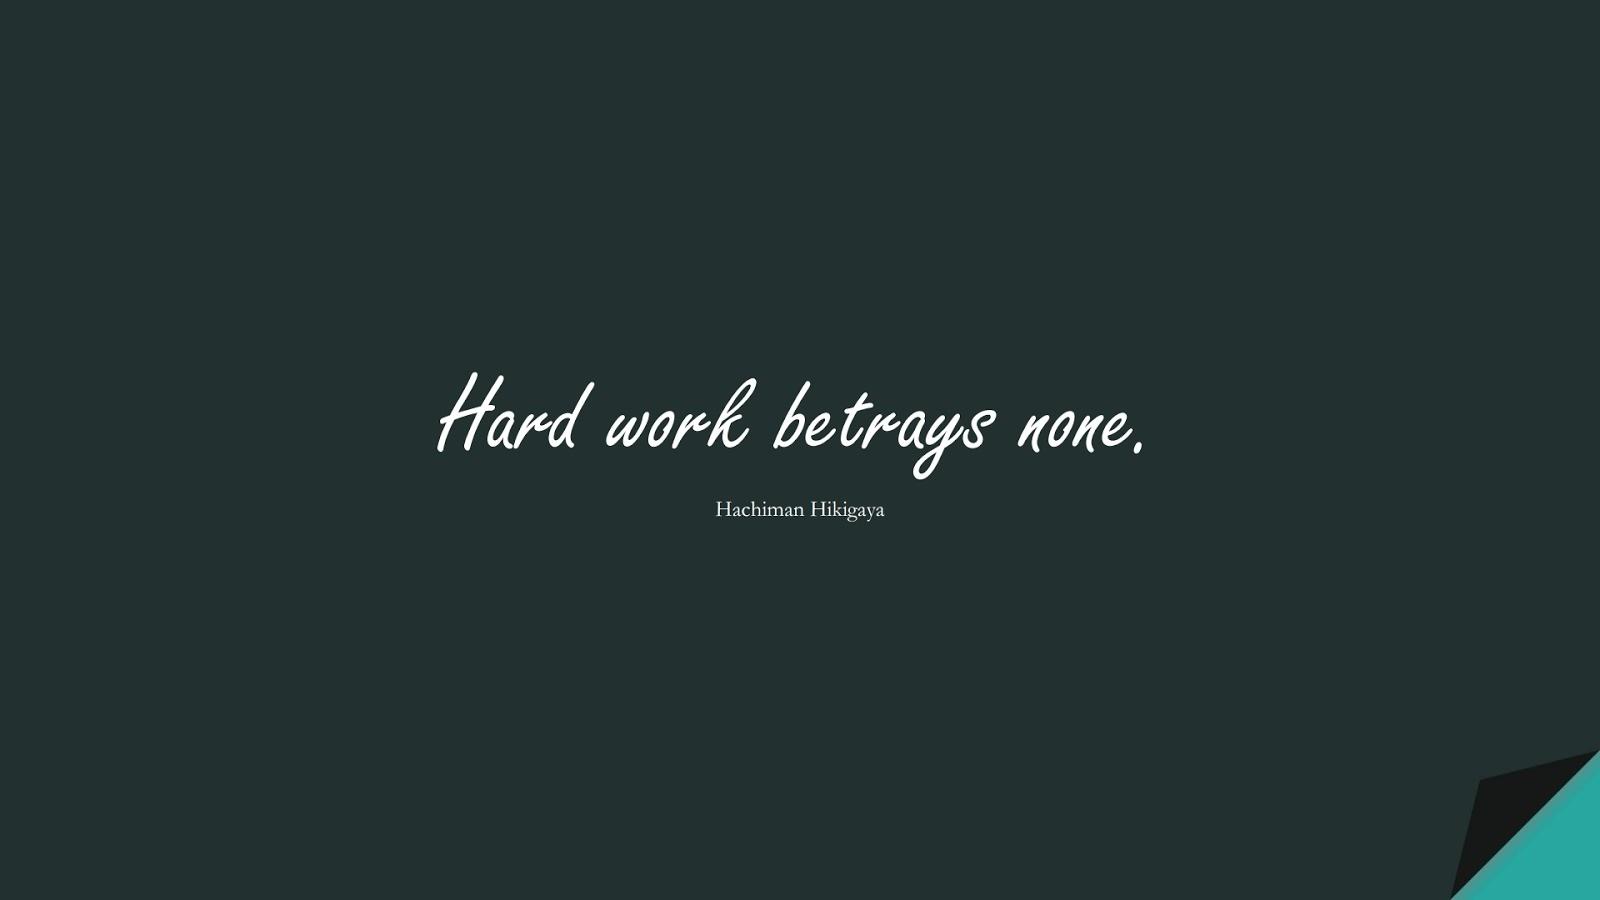 Hard work betrays none. (Hachiman Hikigaya);  #HardWorkQuotes